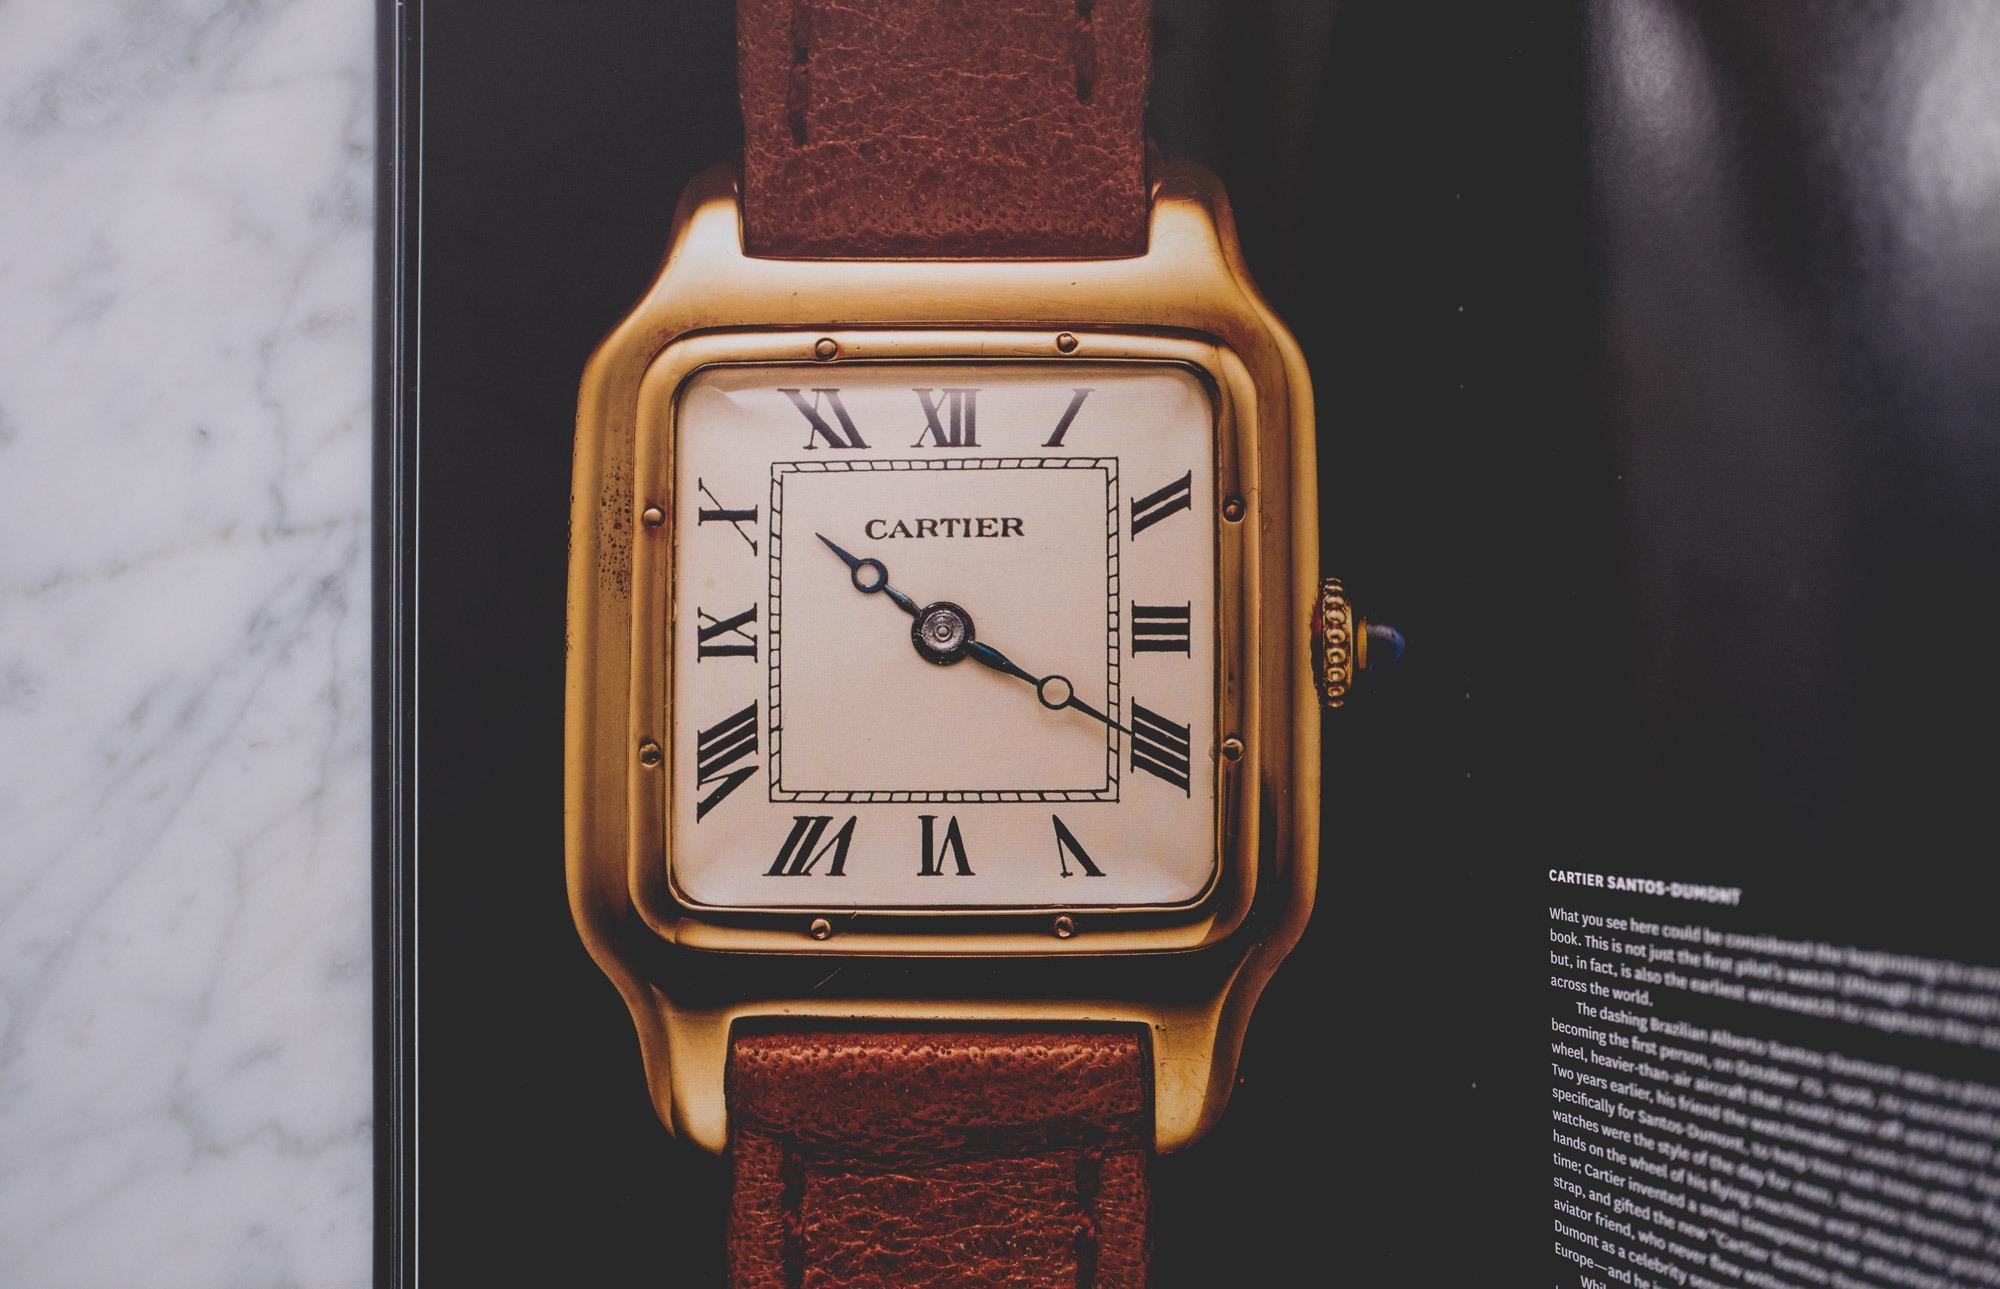 Santos de Cartier - A Man and His Watch